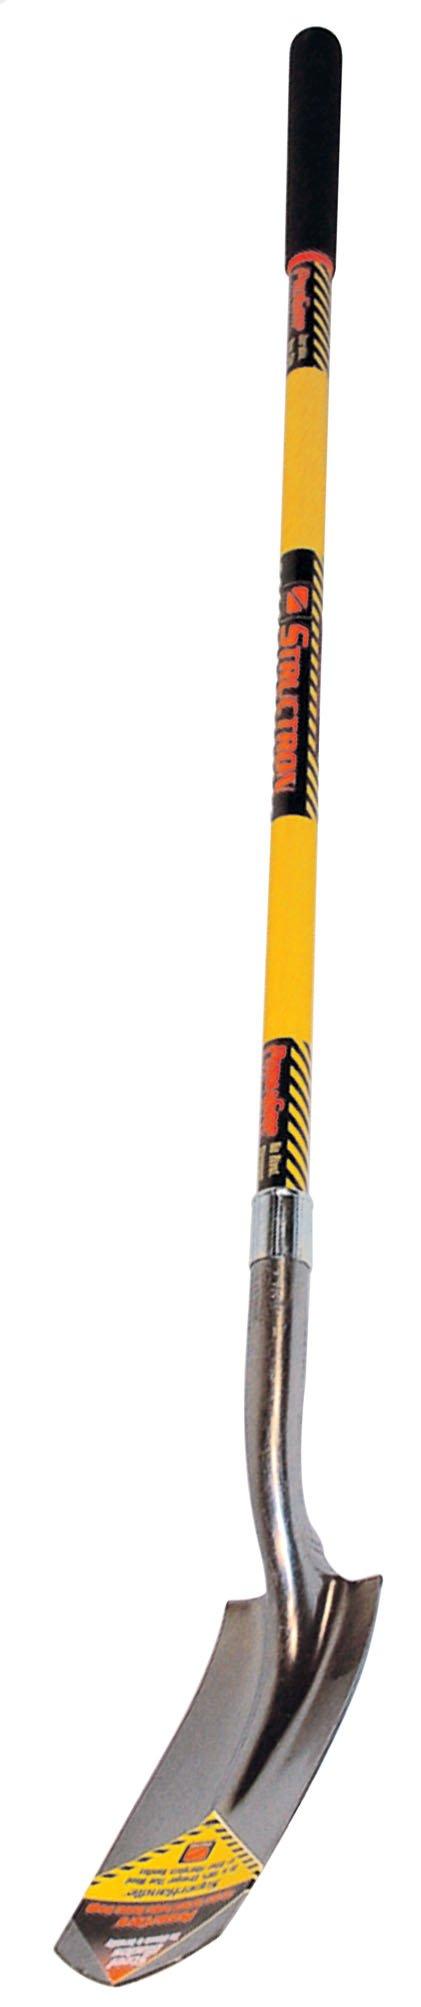 Seymour S702 48-Inch Fiberglass Handle Trenching Shovel